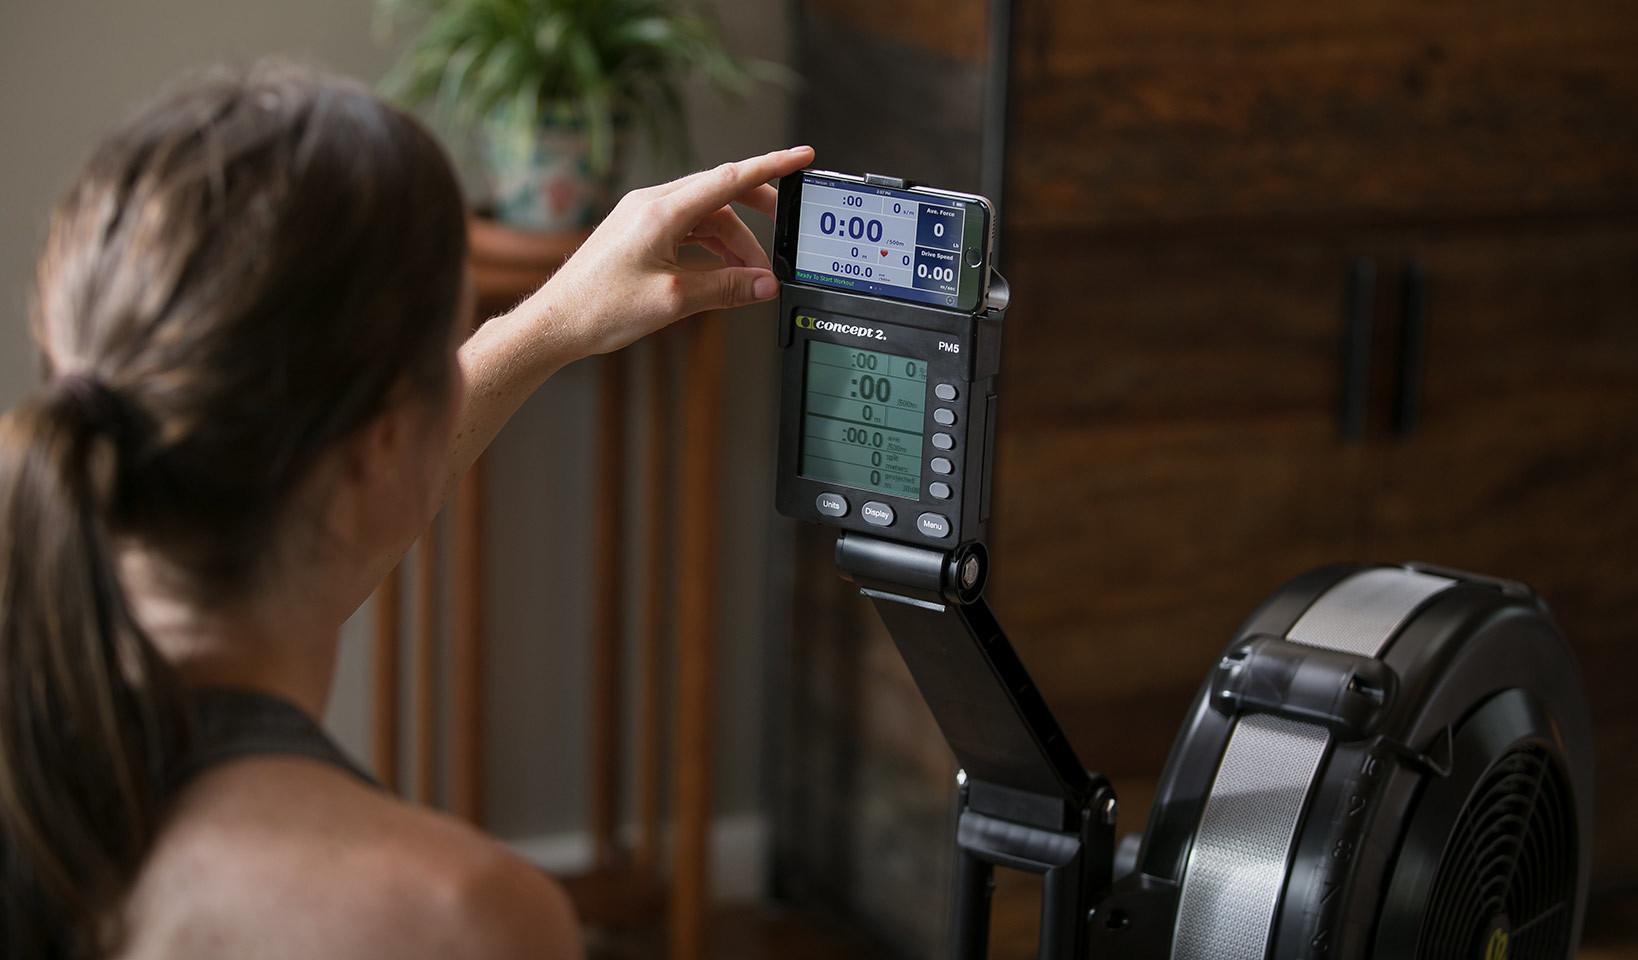 PM5 Monitor & Phone Cradle